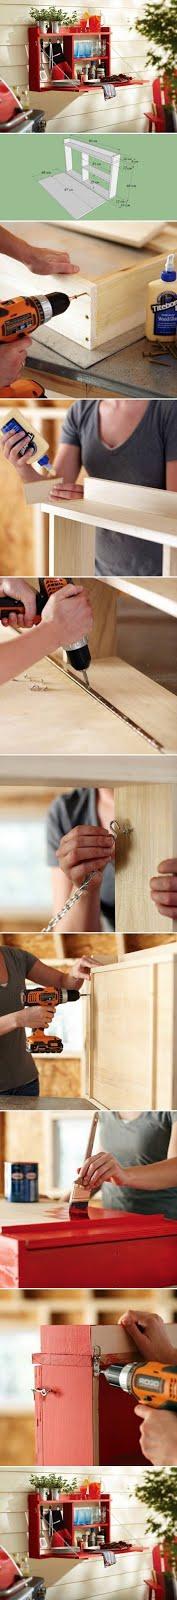 Prateleira reutilize madeira